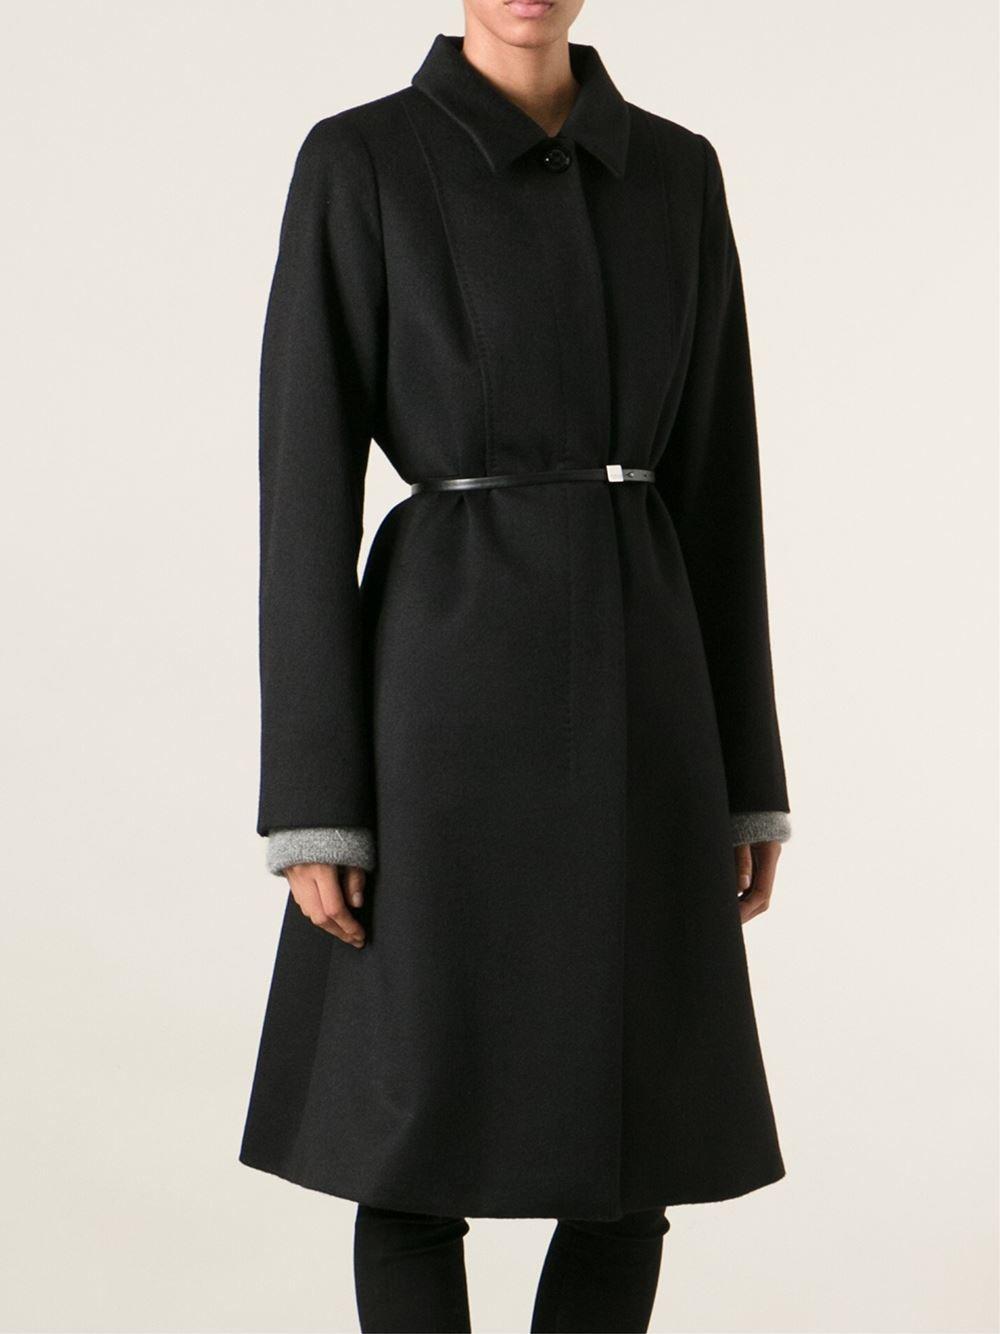 8a43bbc2d412 Max Mara Belted Flared Coat - Divo - Farfetch.com | coats | Fashion ...